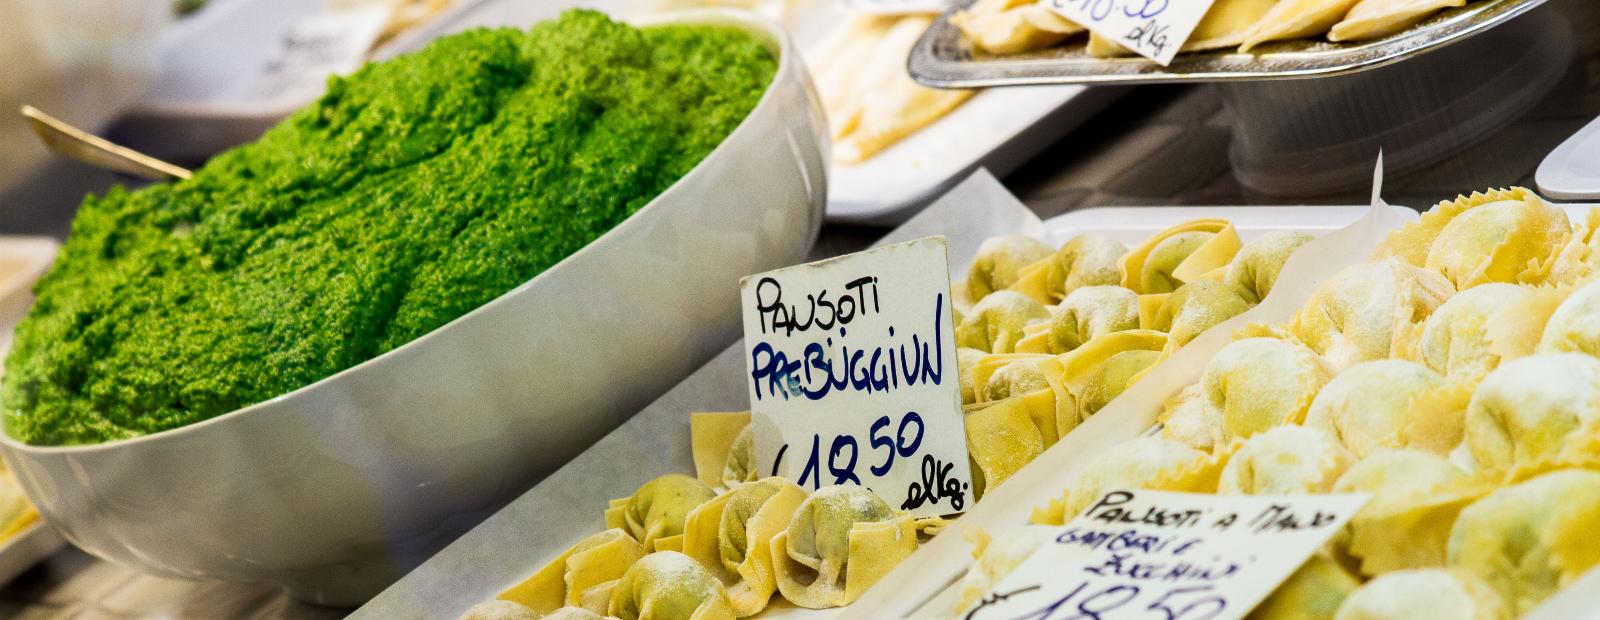 Food market in Genoa: Let's discover MOG